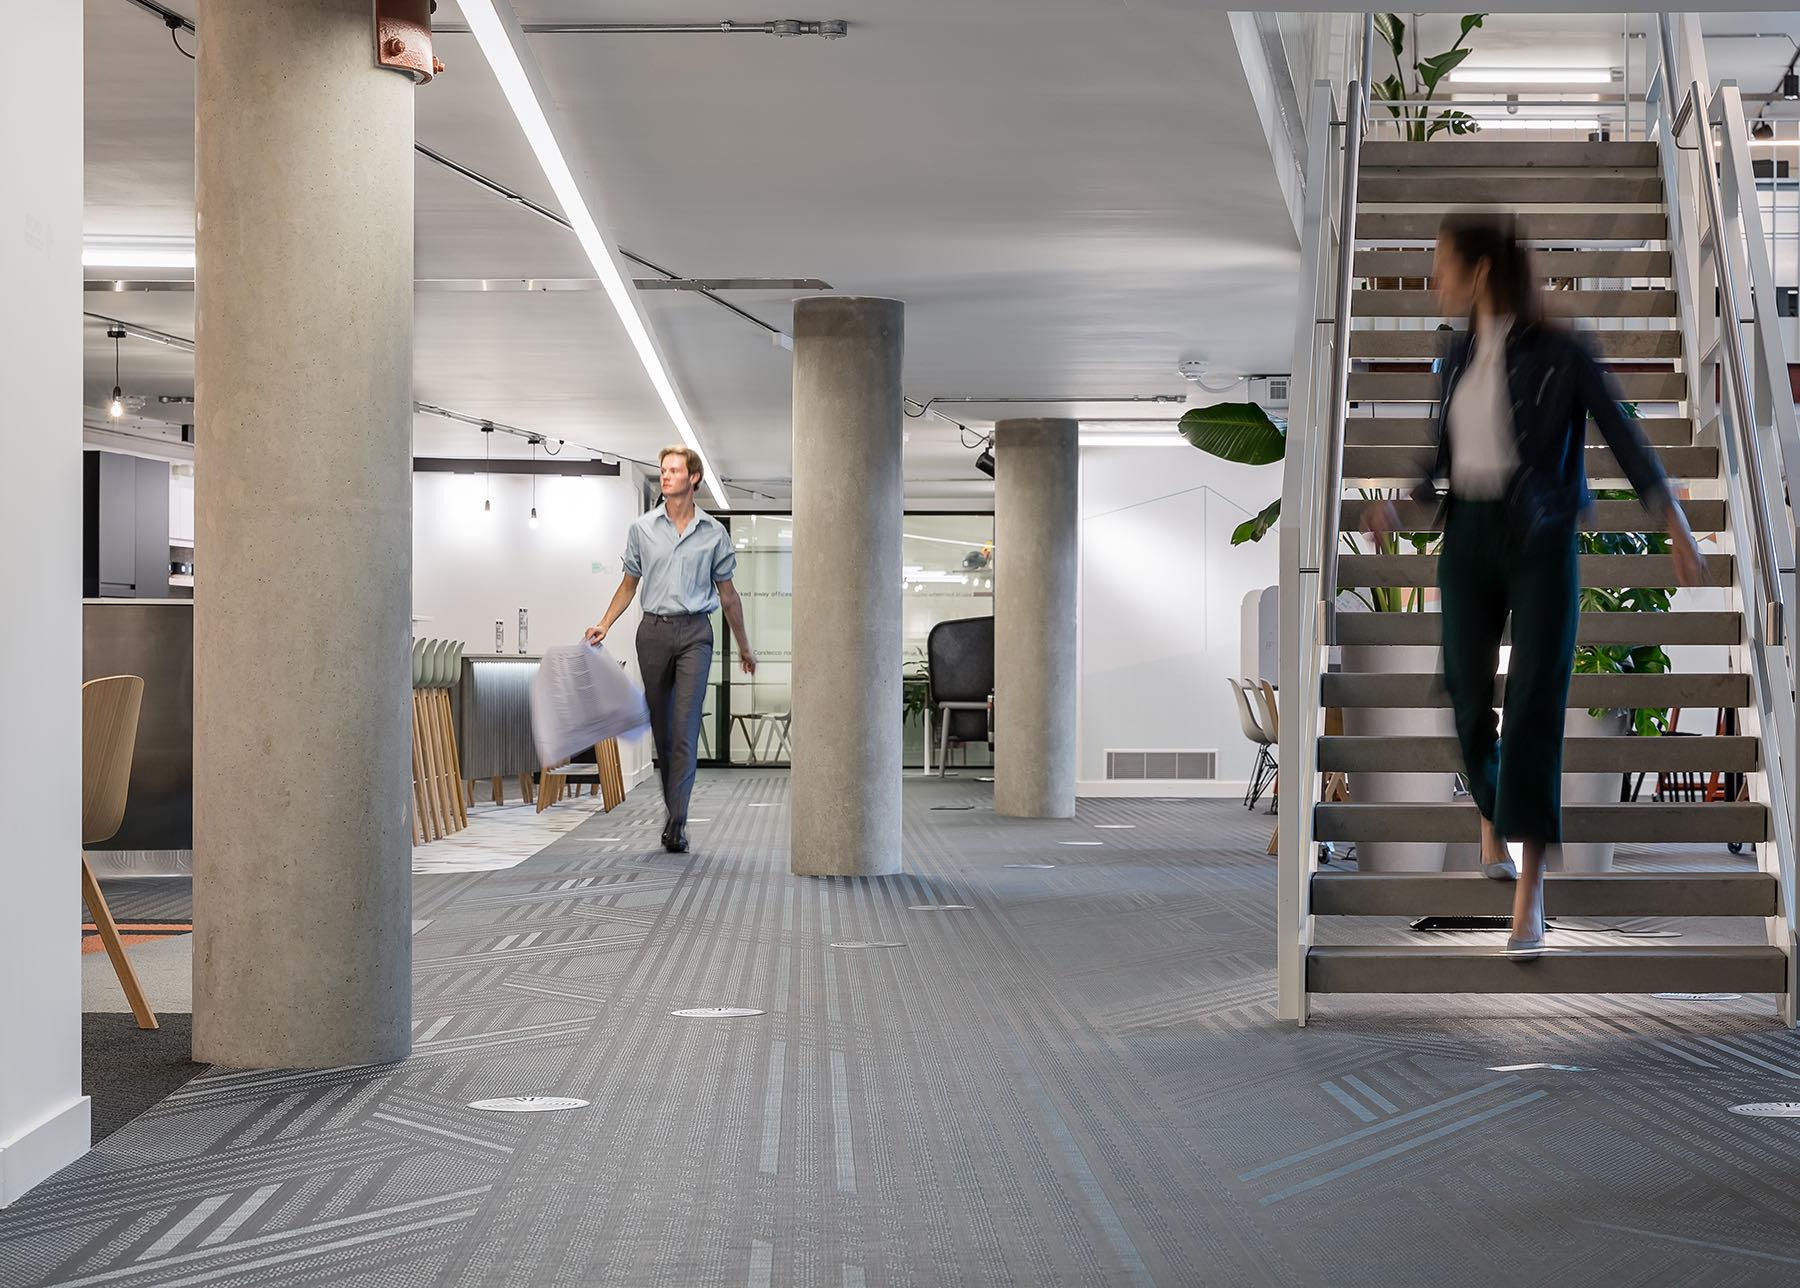 oktra-london-office-1